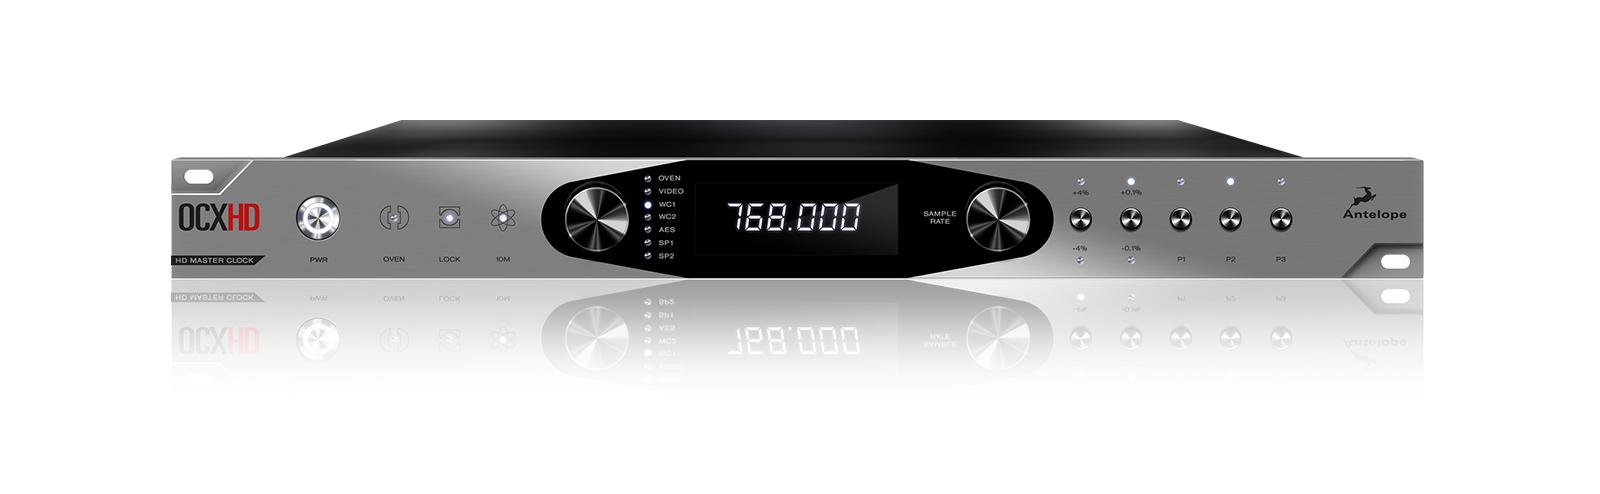 Antelope Audio OCXHD 768 kHz HD Master Clock OCXHD